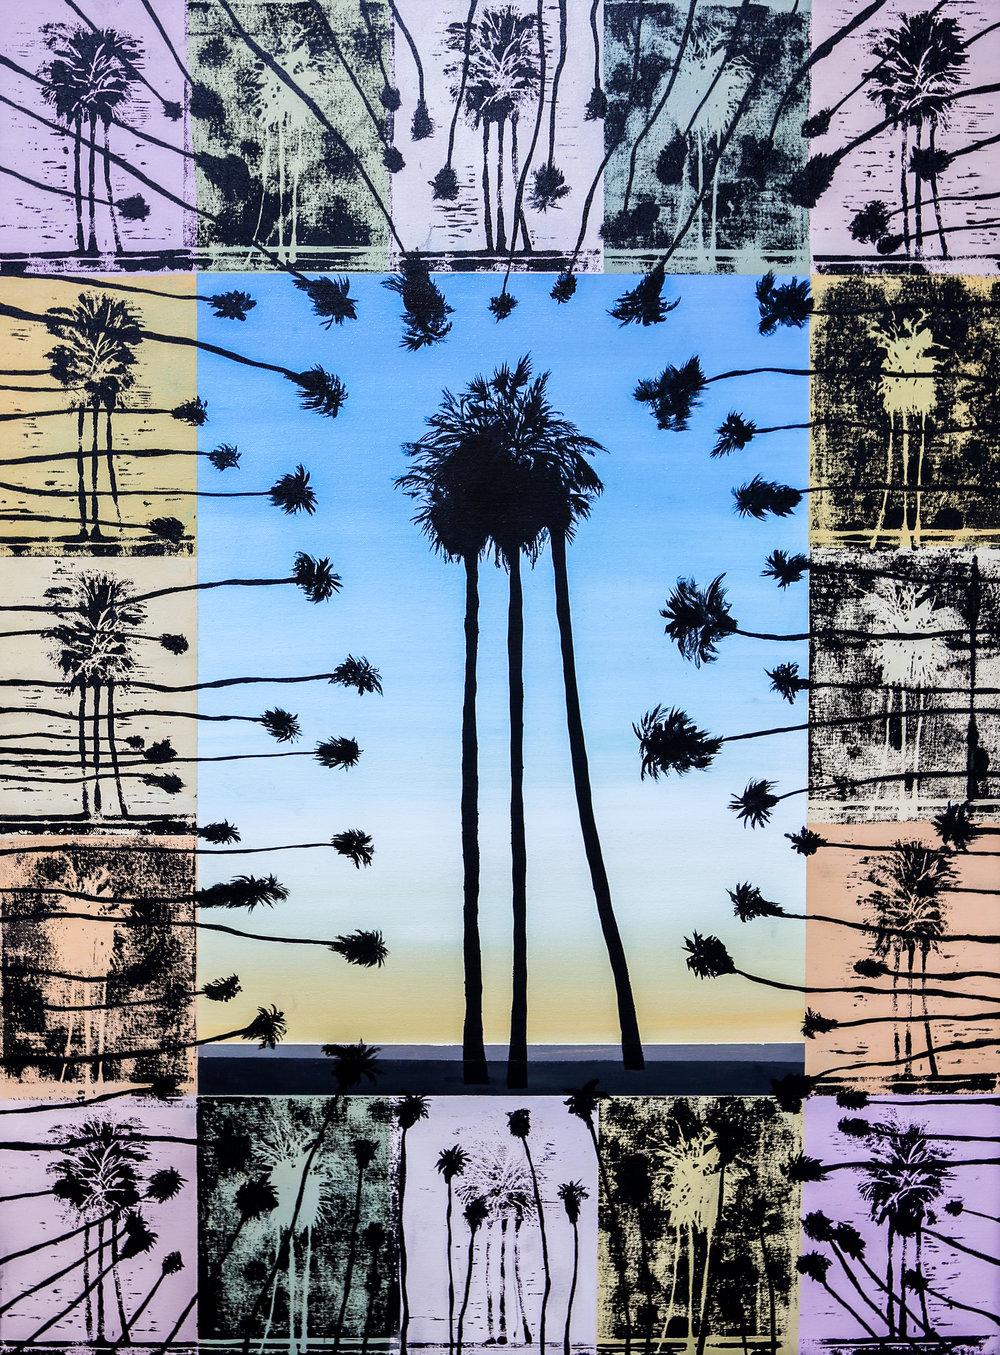 151 Palm Trees